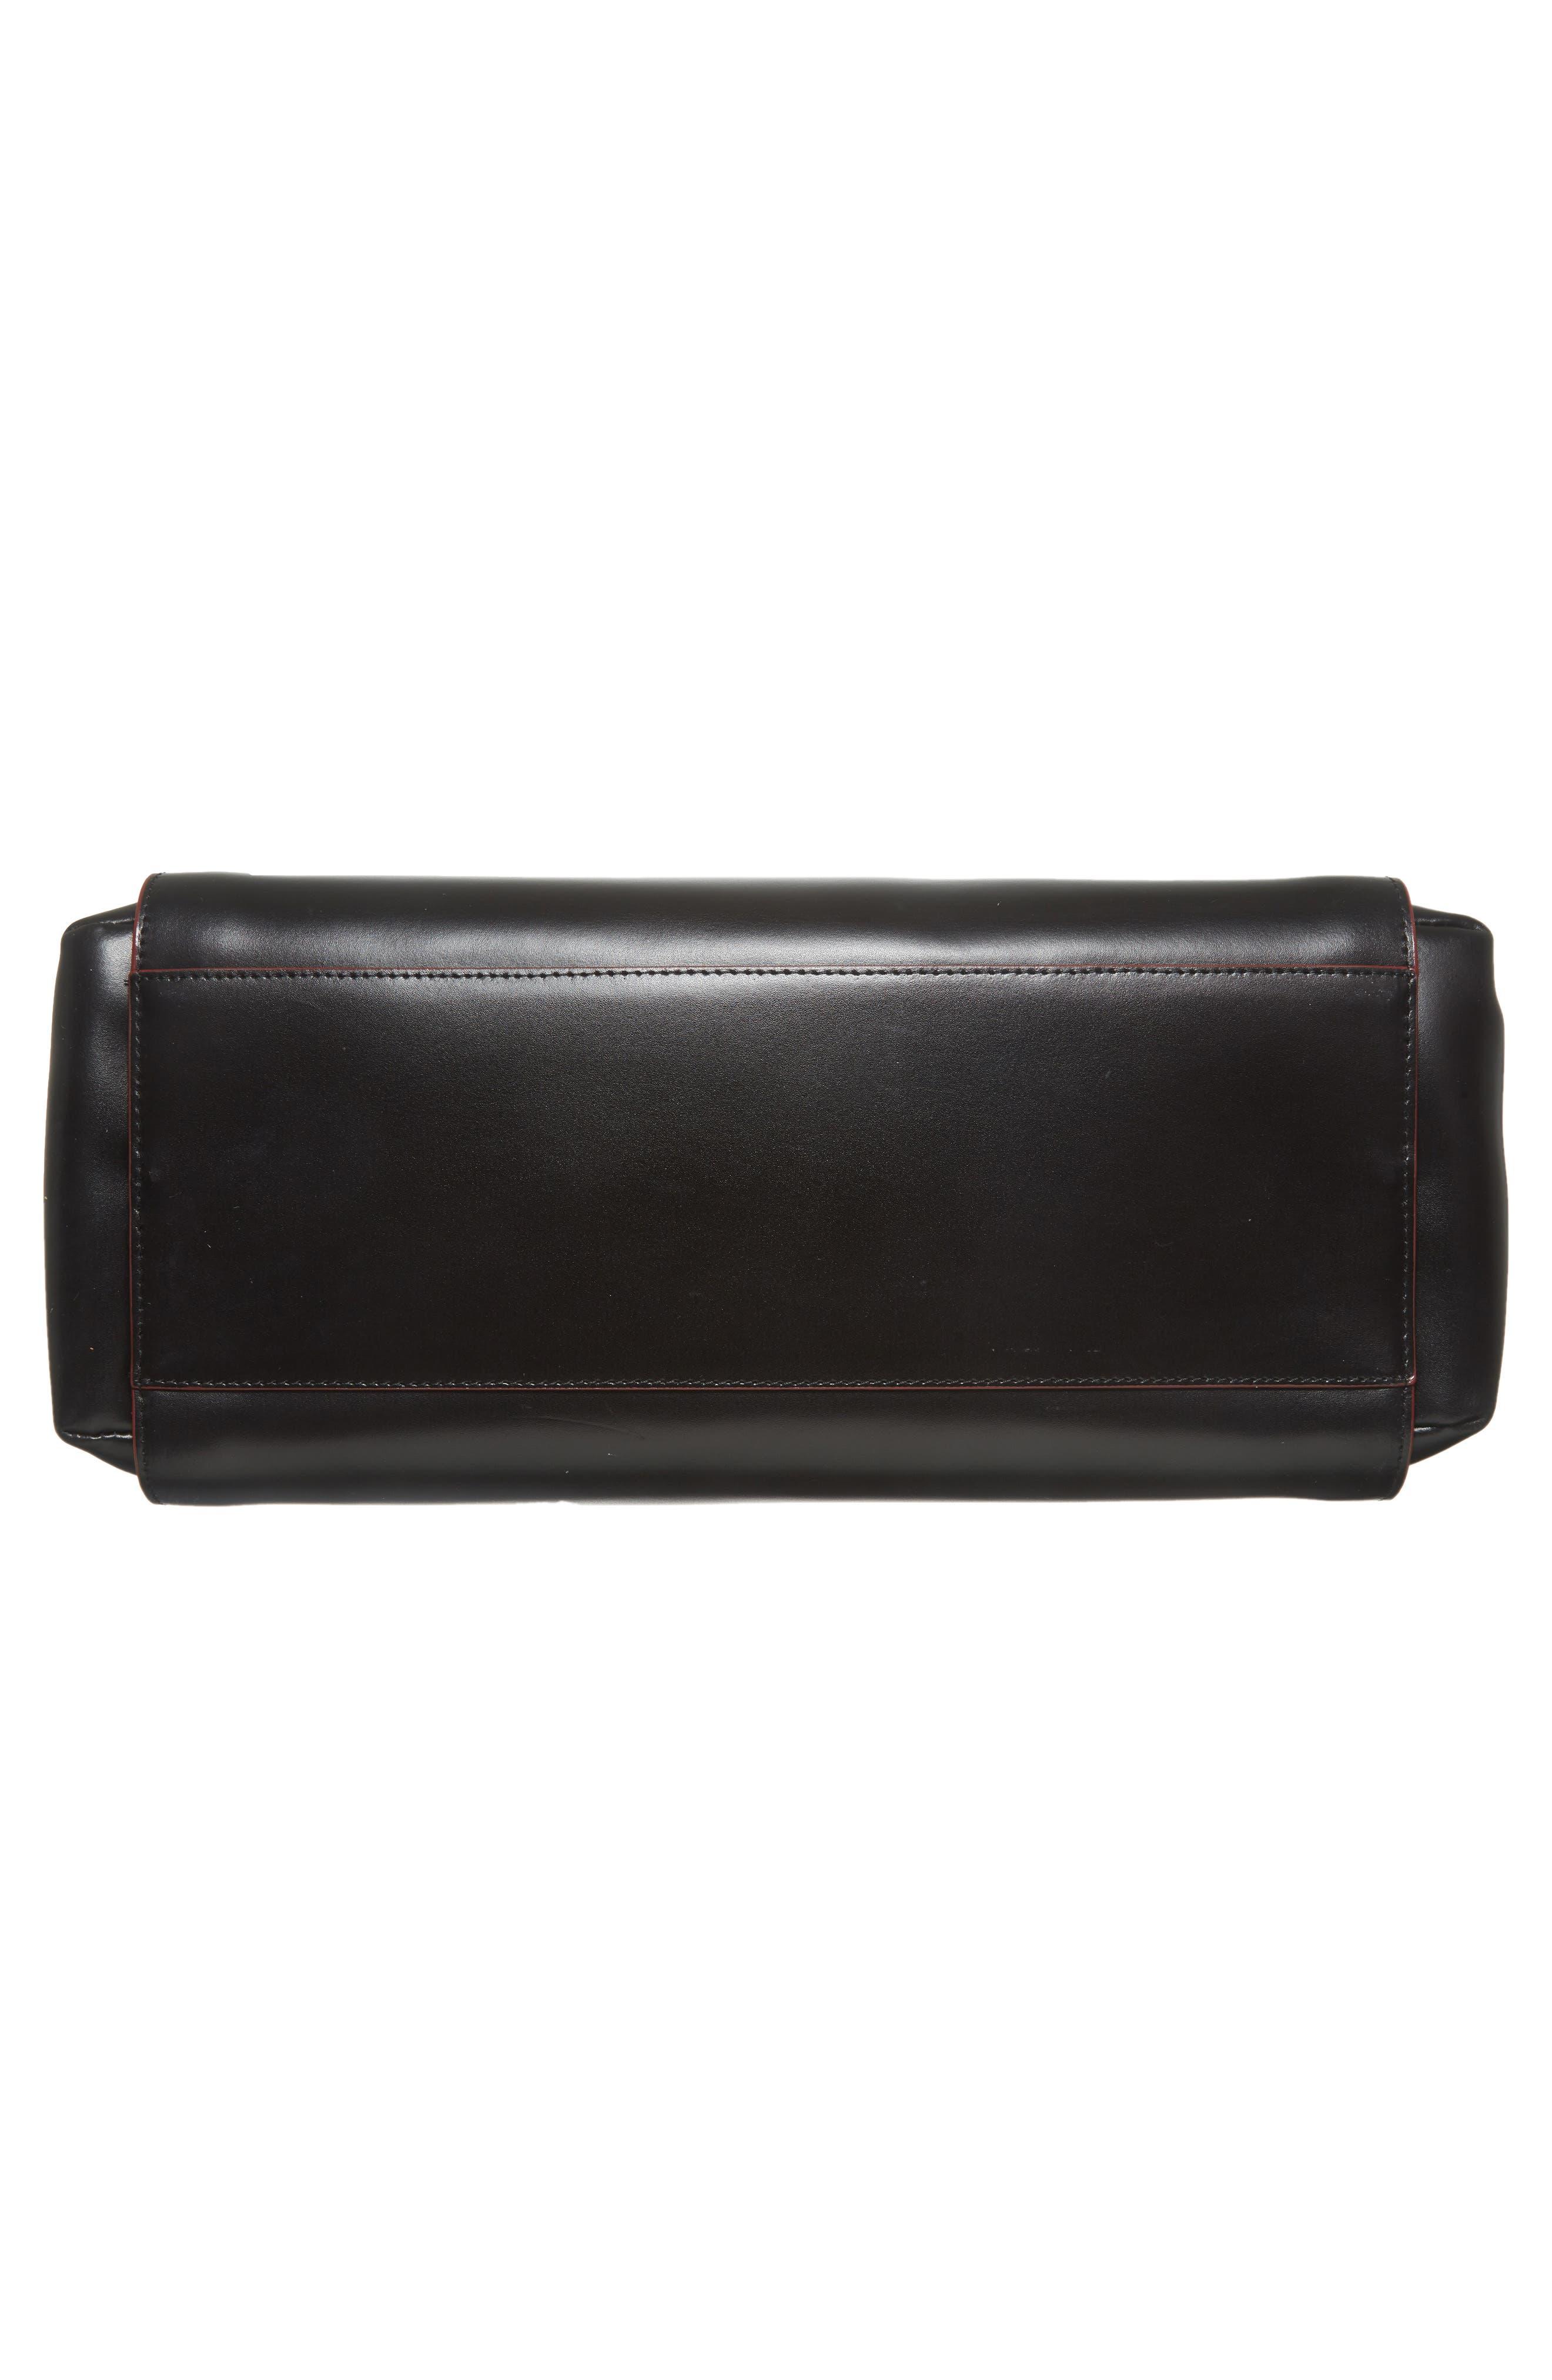 Audrey Under Lock & Key - Zola RFID Leather Tote,                             Alternate thumbnail 6, color,                             BLACK